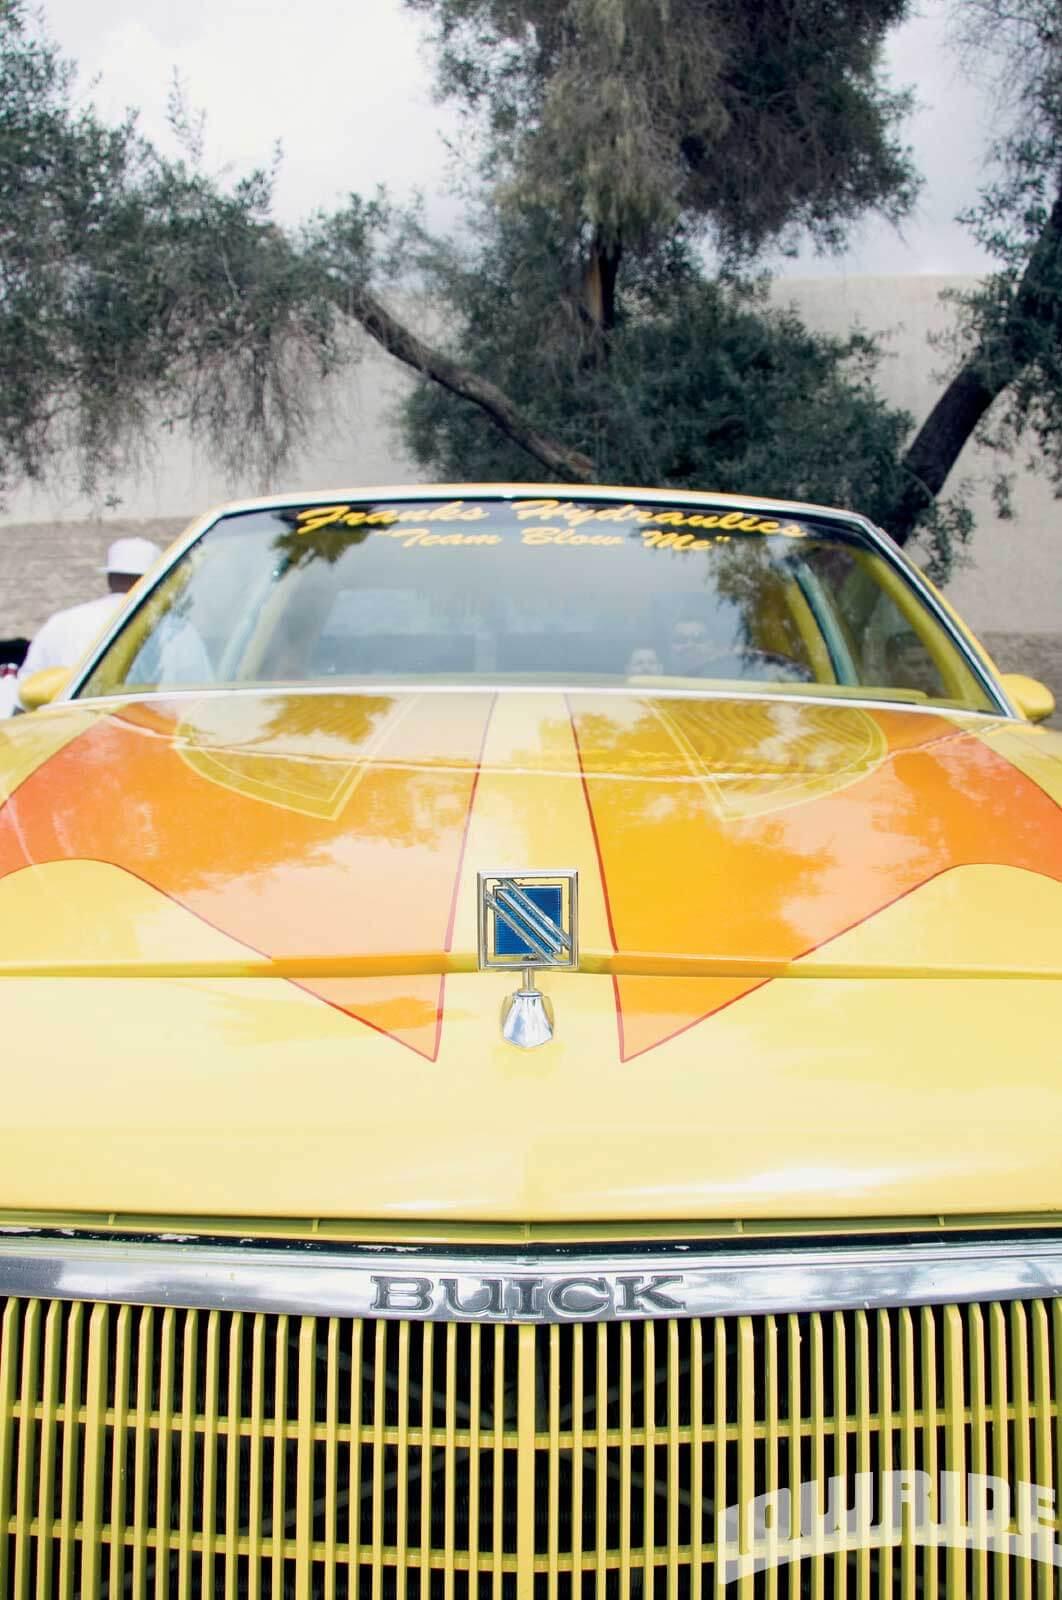 Lowrider Garage & Joe Ray Visit Franks Hydraulics